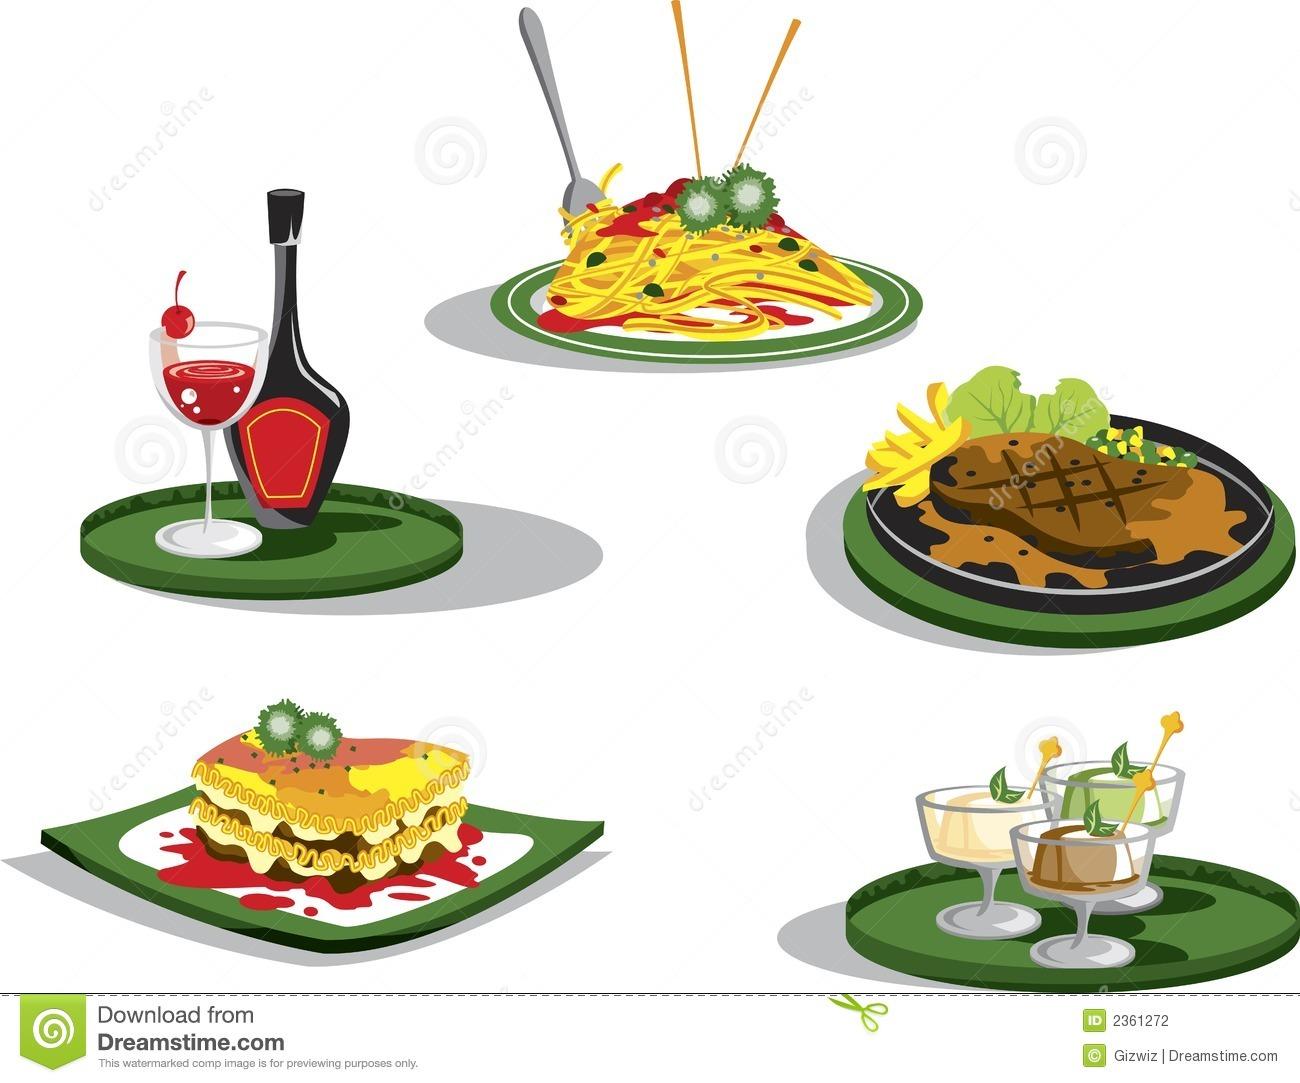 3851 Restaurant free clipart.